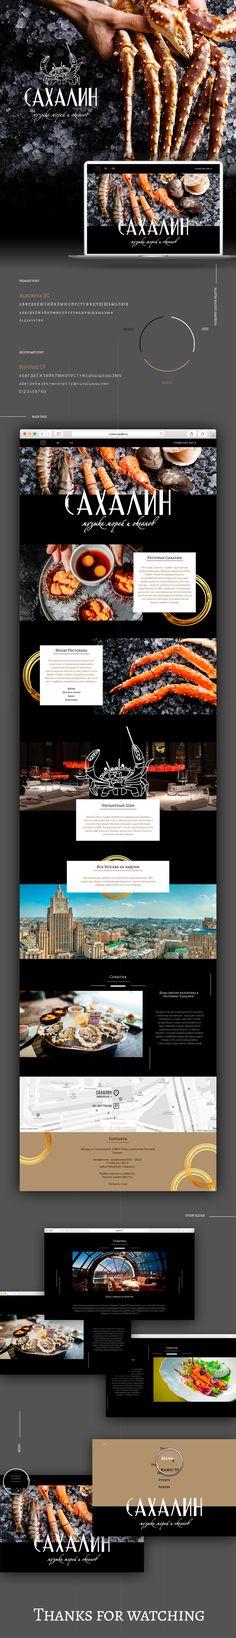 "Ресторан морепродуктов ""Сахалин"" on Behance Behance, Photoshop"